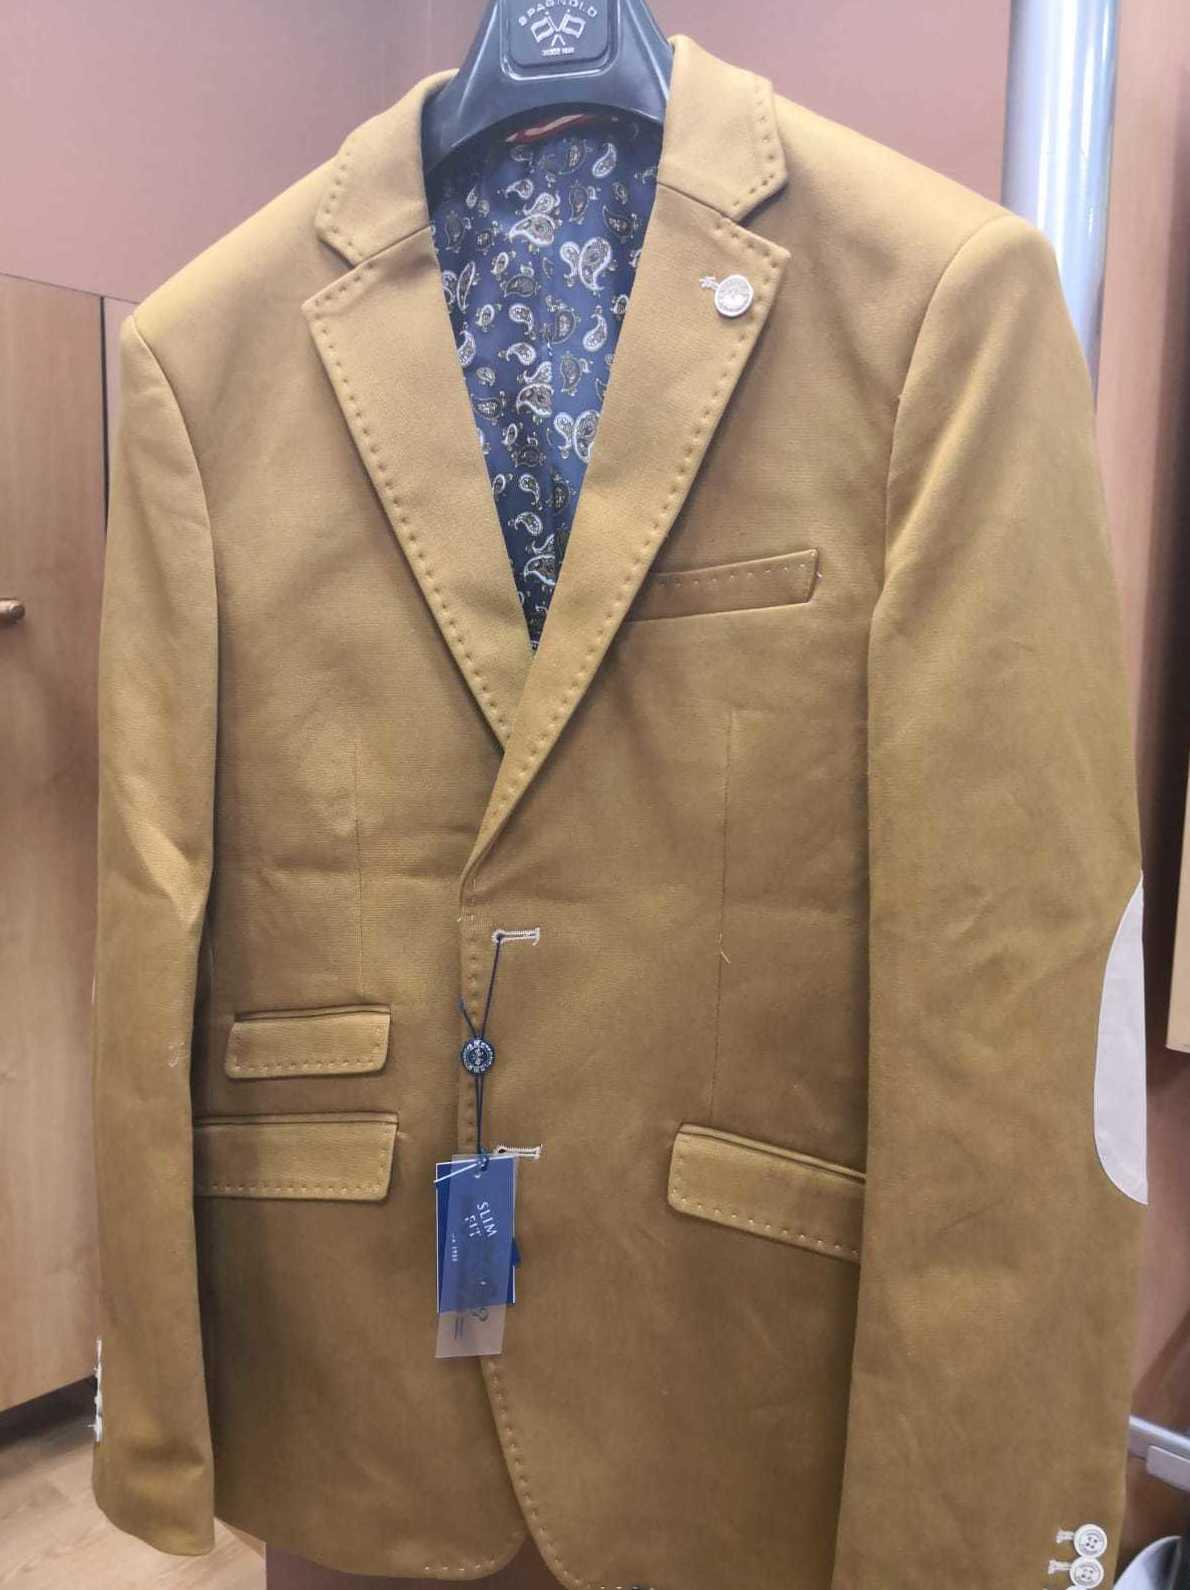 CLOTHES MAN - AVANCE DE OTOÑO - Albolote Granada